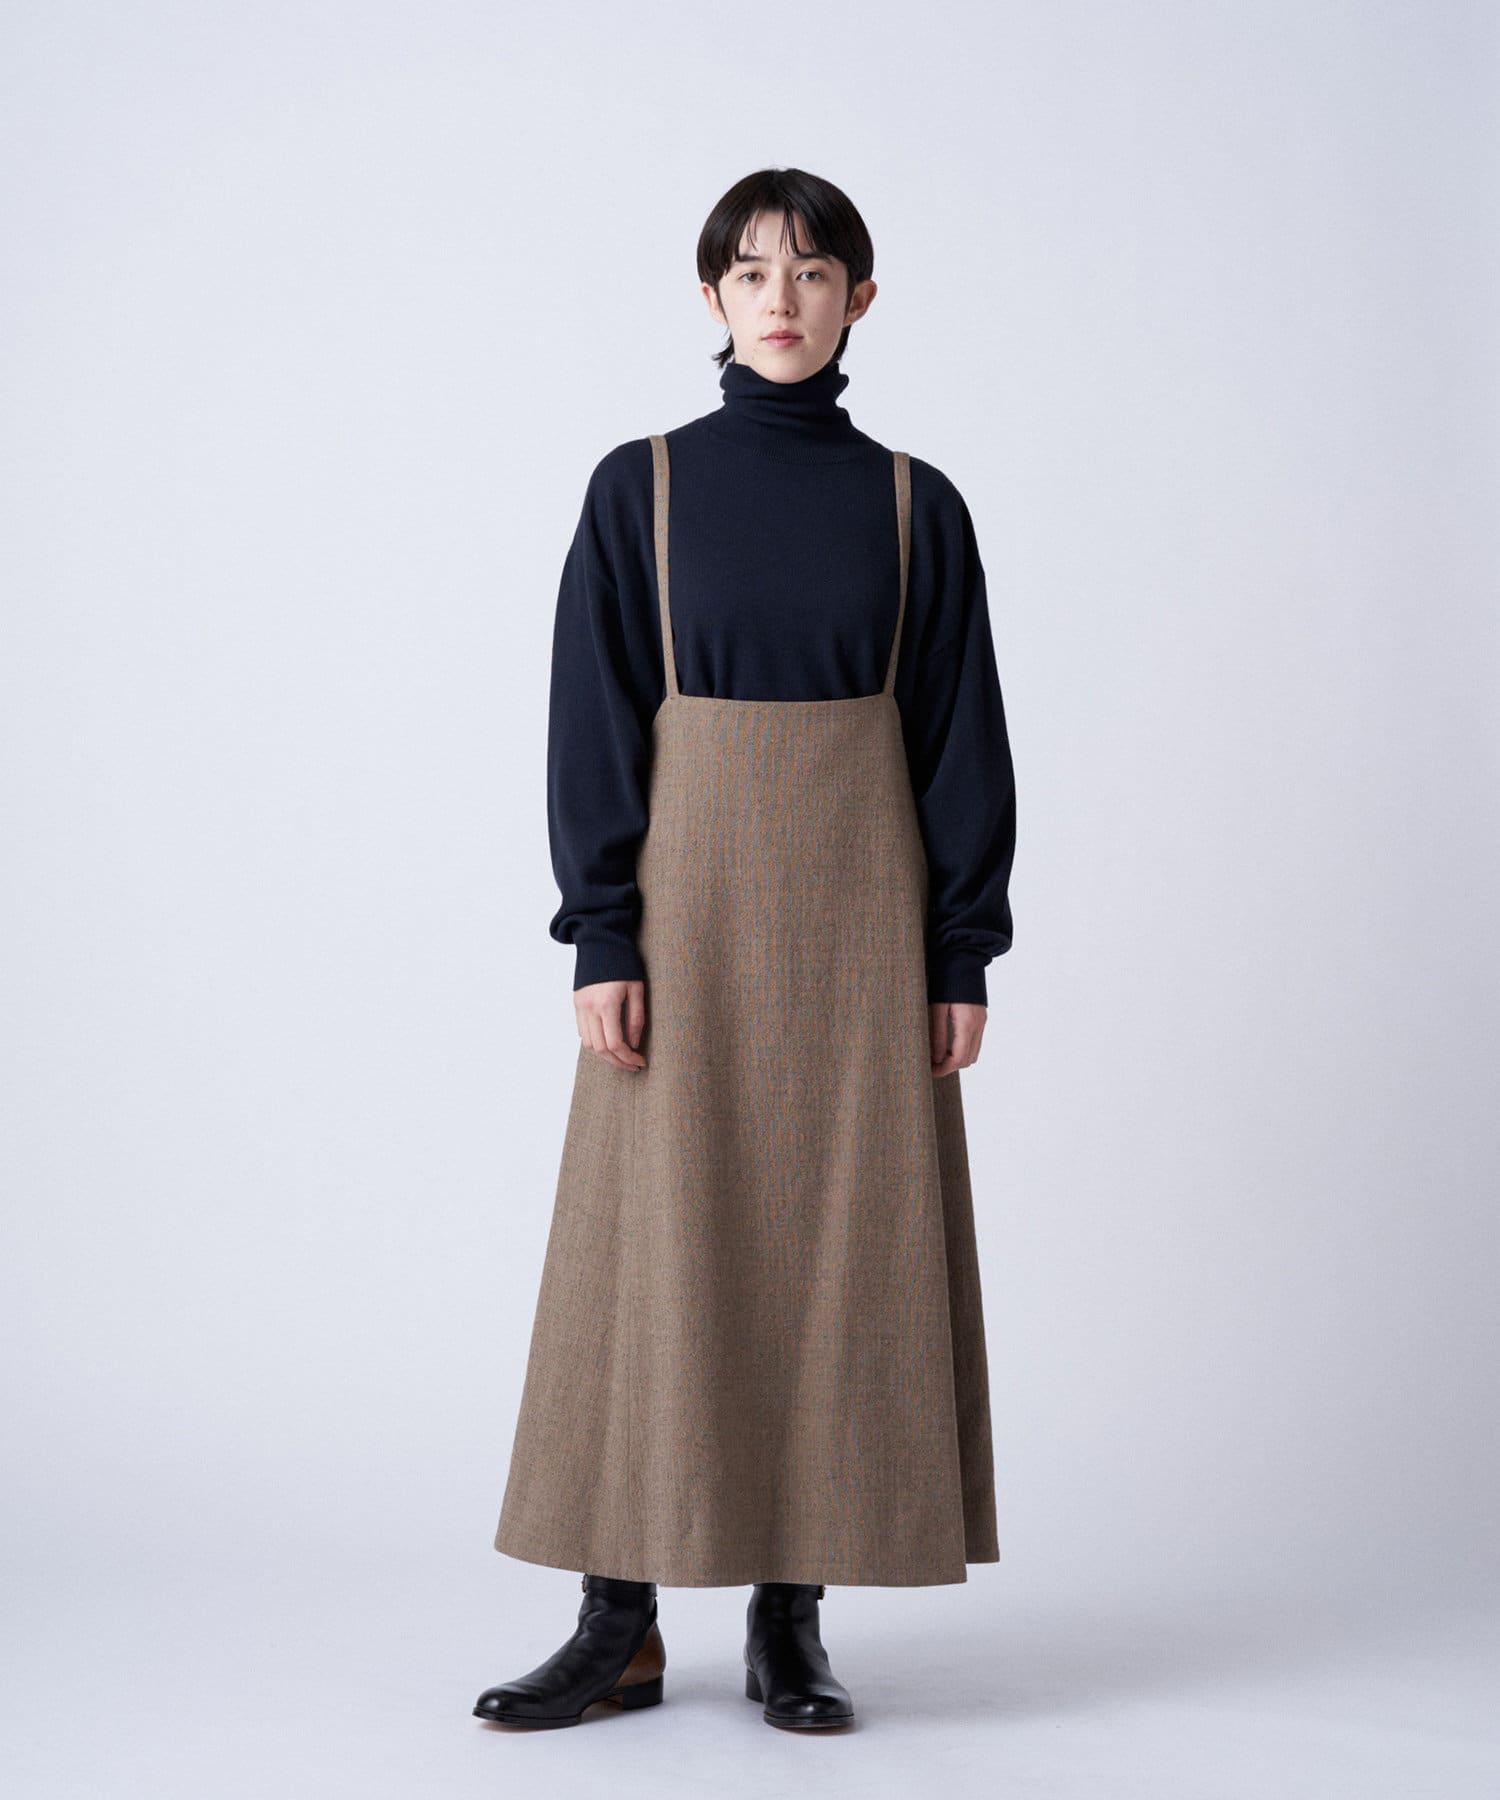 BLOOM&BRANCH(ブルームアンドブランチ) Phlannèl / womens Loop Yarn Skirt